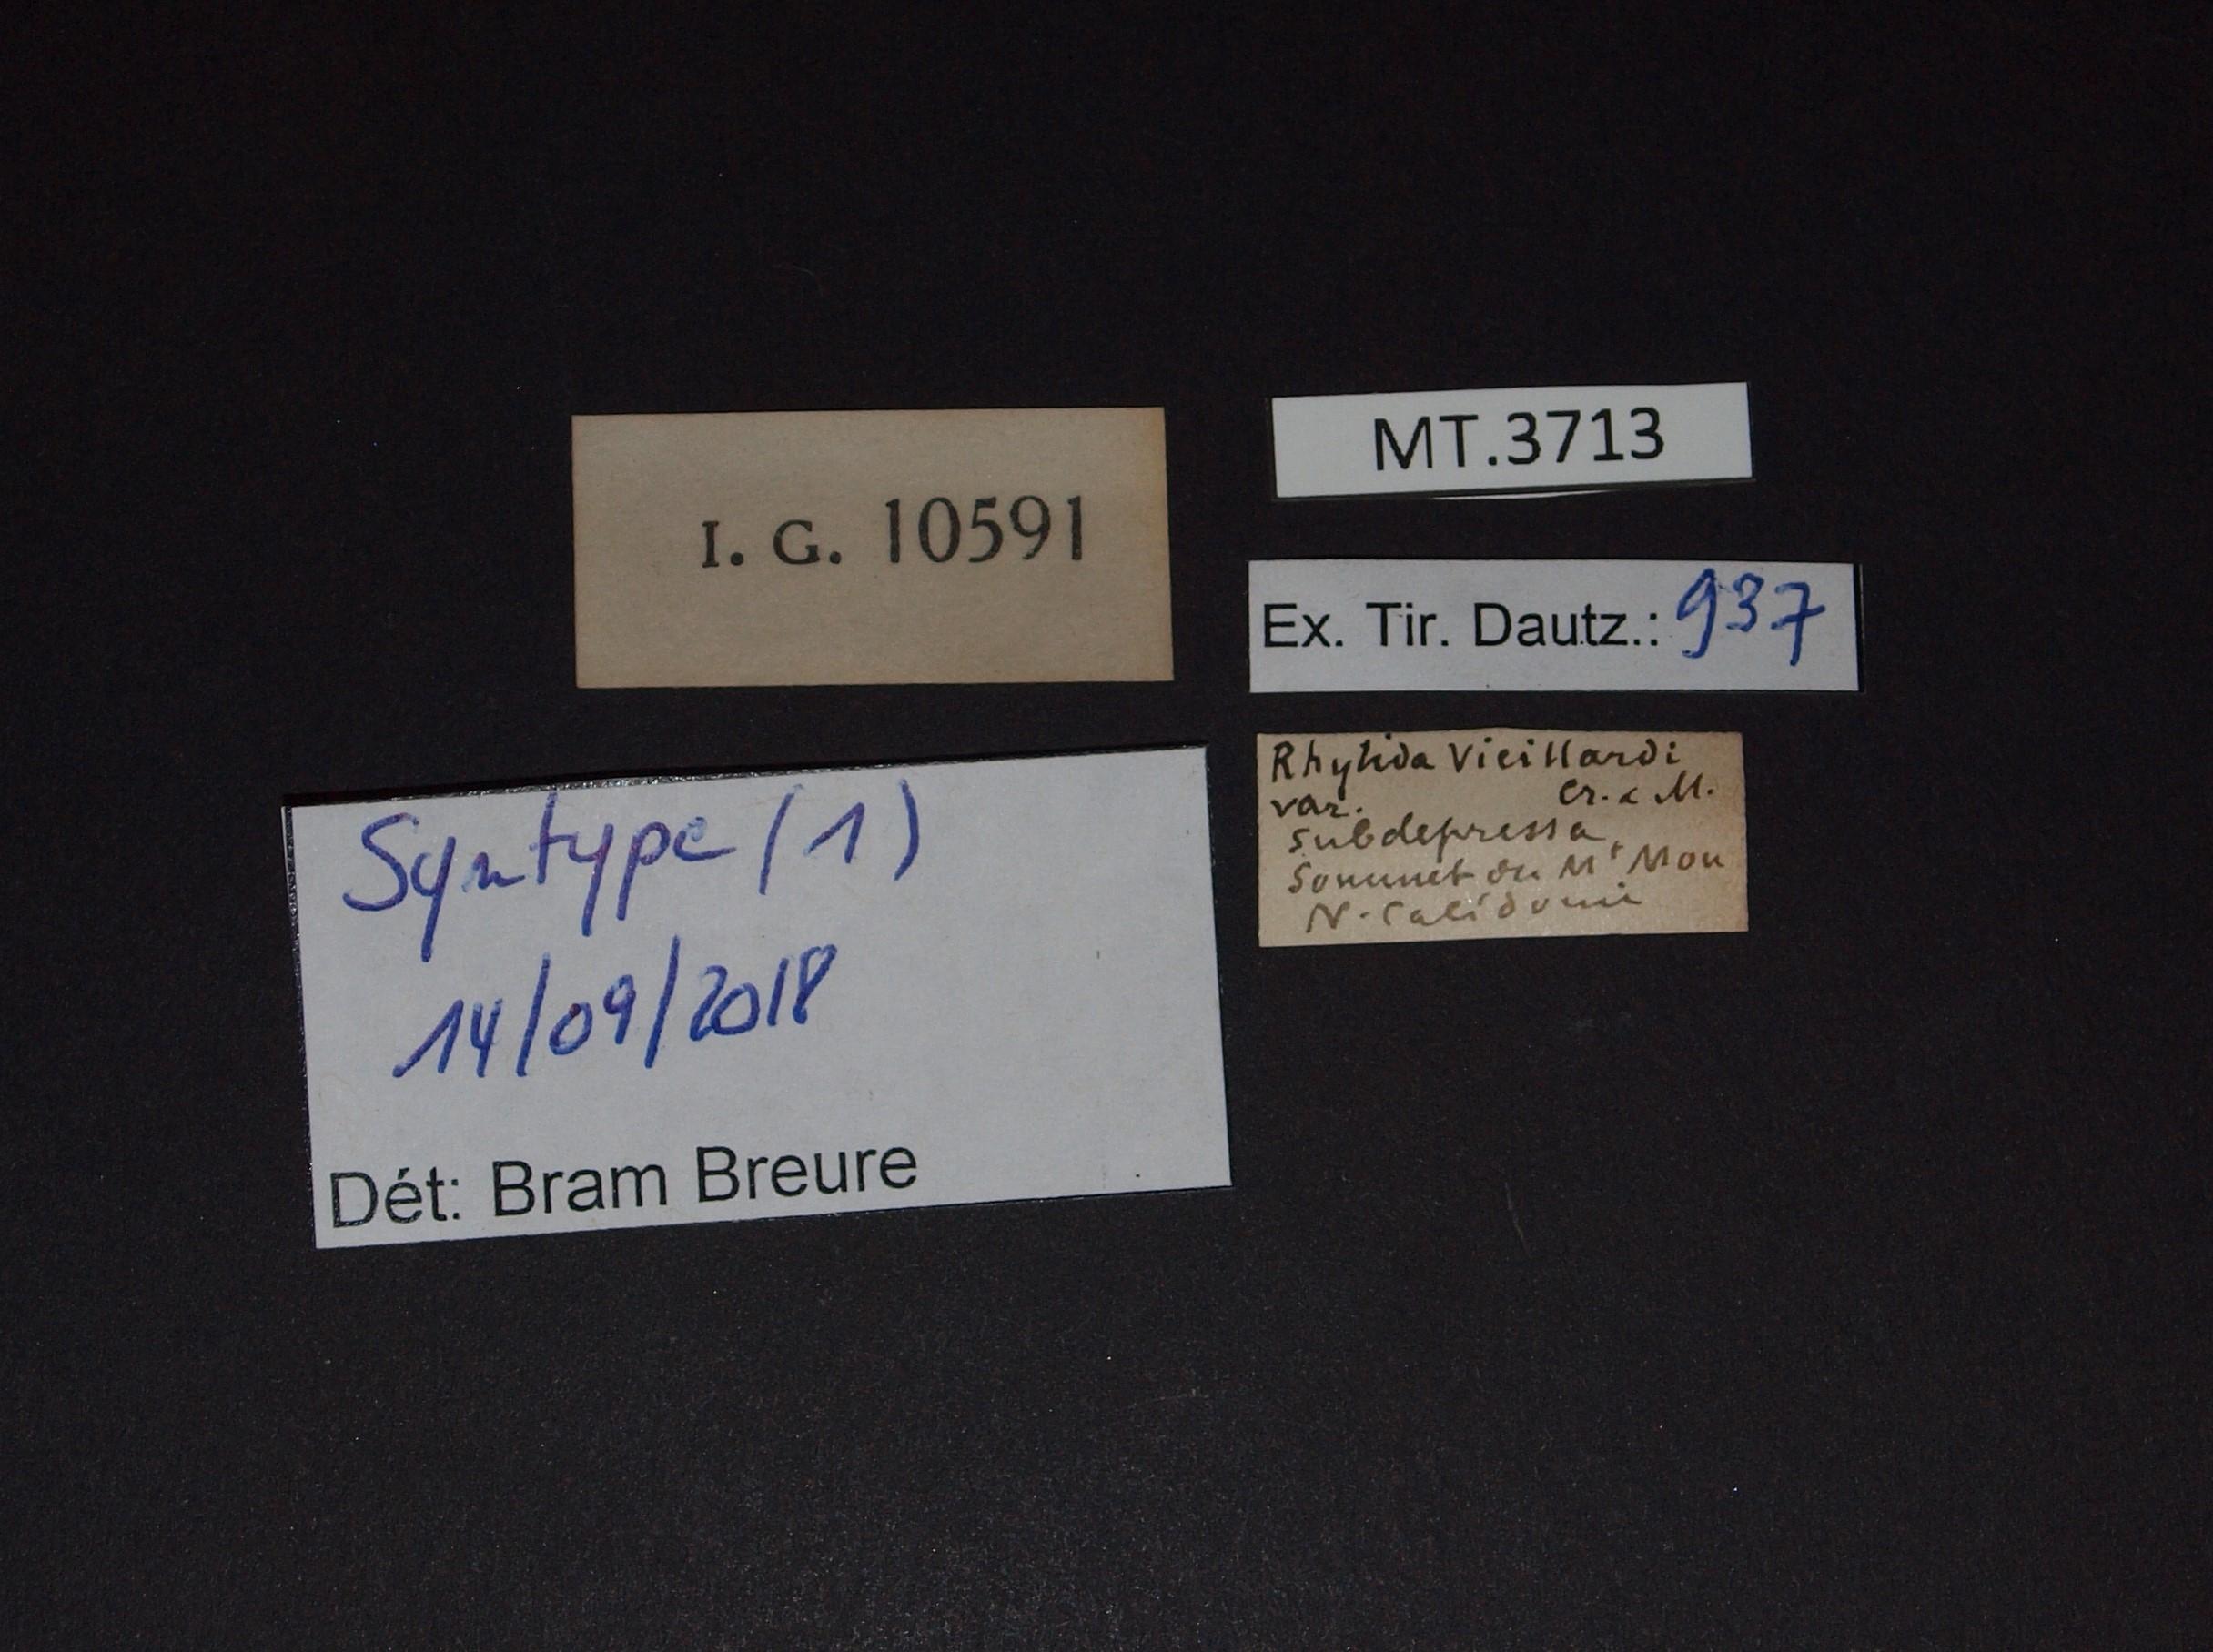 BE-RBINS-INV MT.3713 Rhytida vieillardi var. subdepressa LABELS.jpg